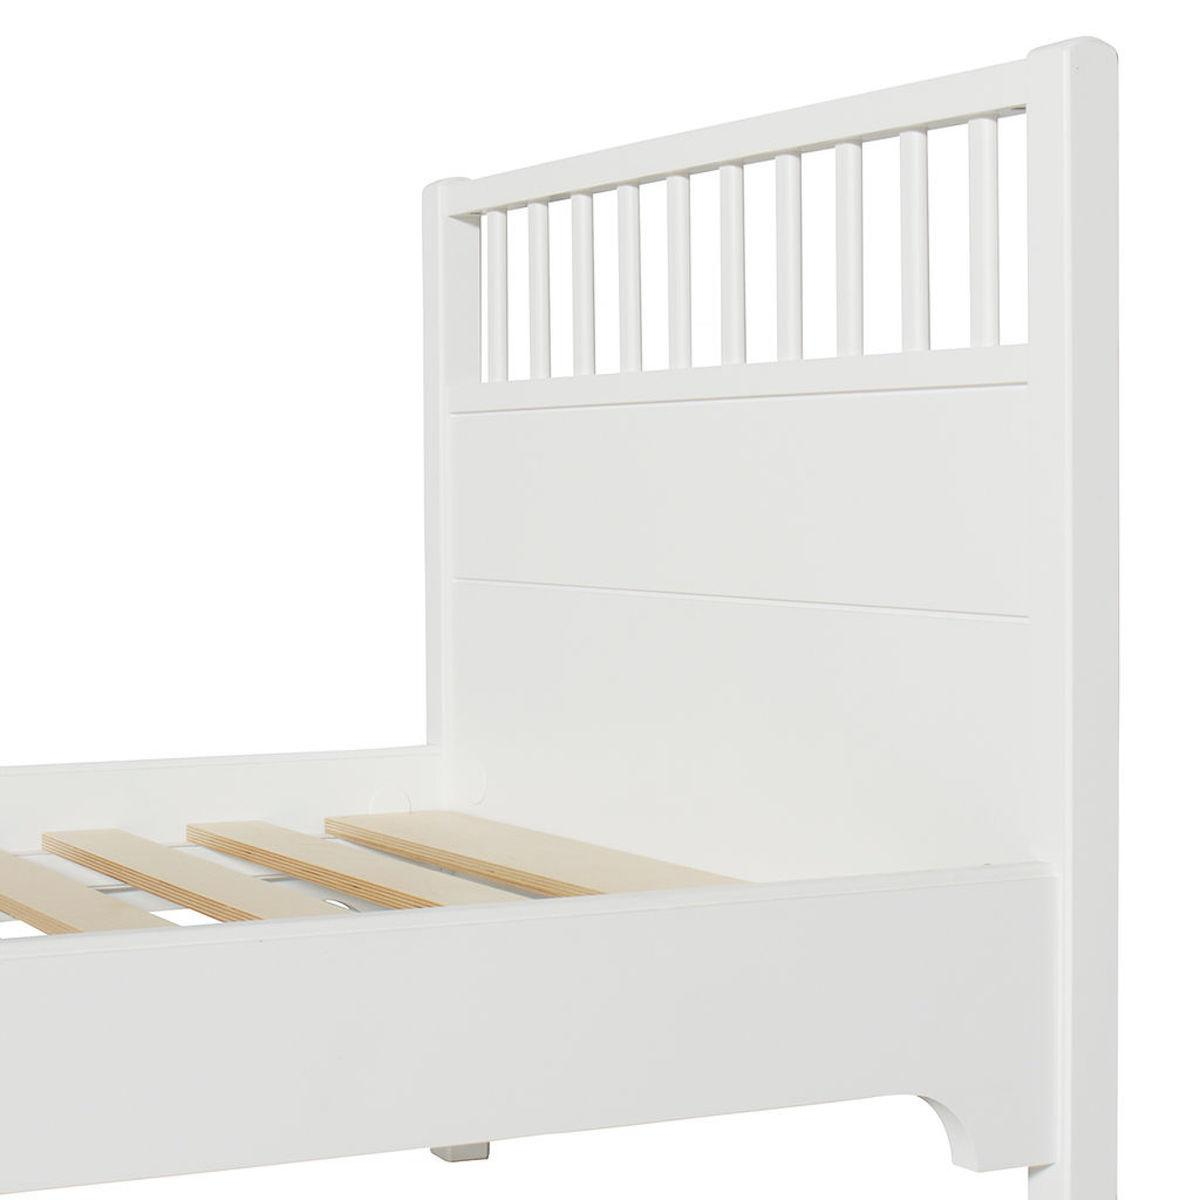 Lit 90x200cm SEASIDE CLASSIC Oliver Furniture blanc